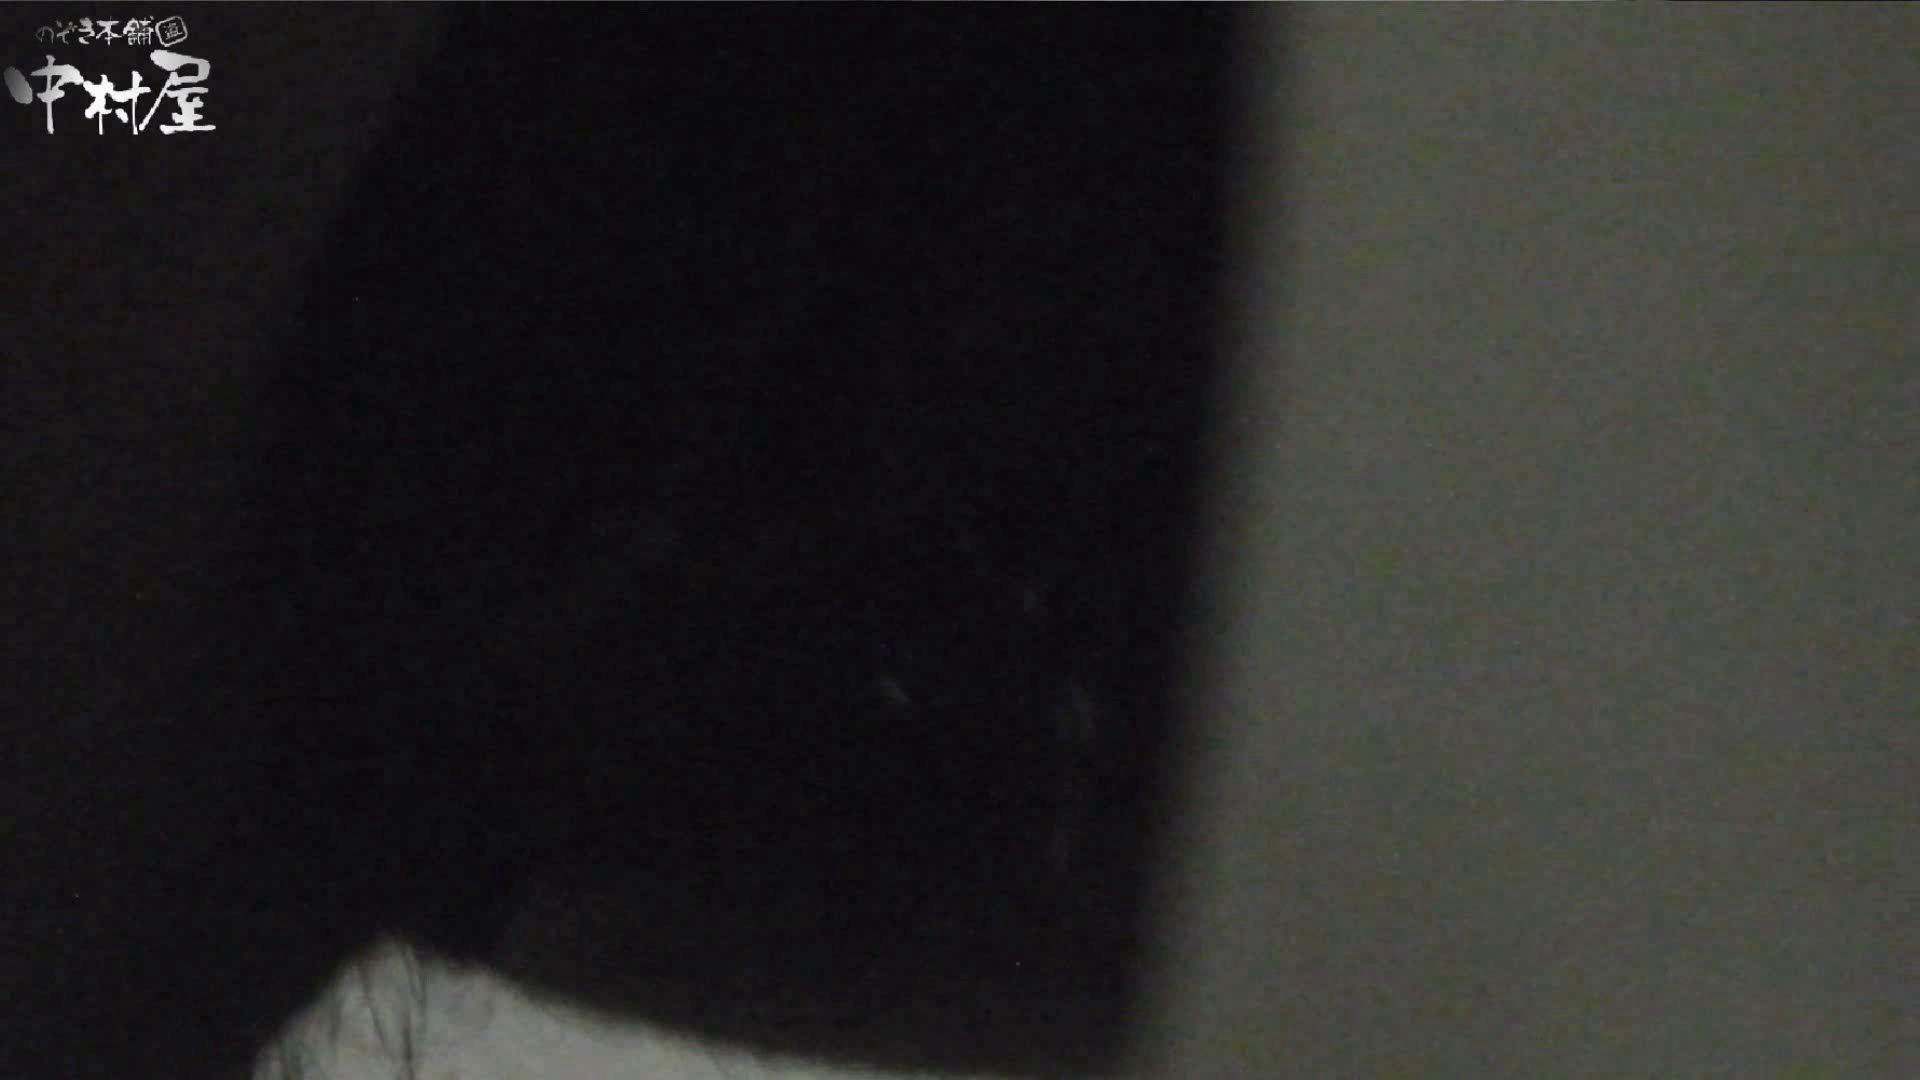 vol.42 命がけ潜伏洗面所! カカト上げながら・硬度強(太)・180g HなOL セックス無修正動画無料 79pic 44